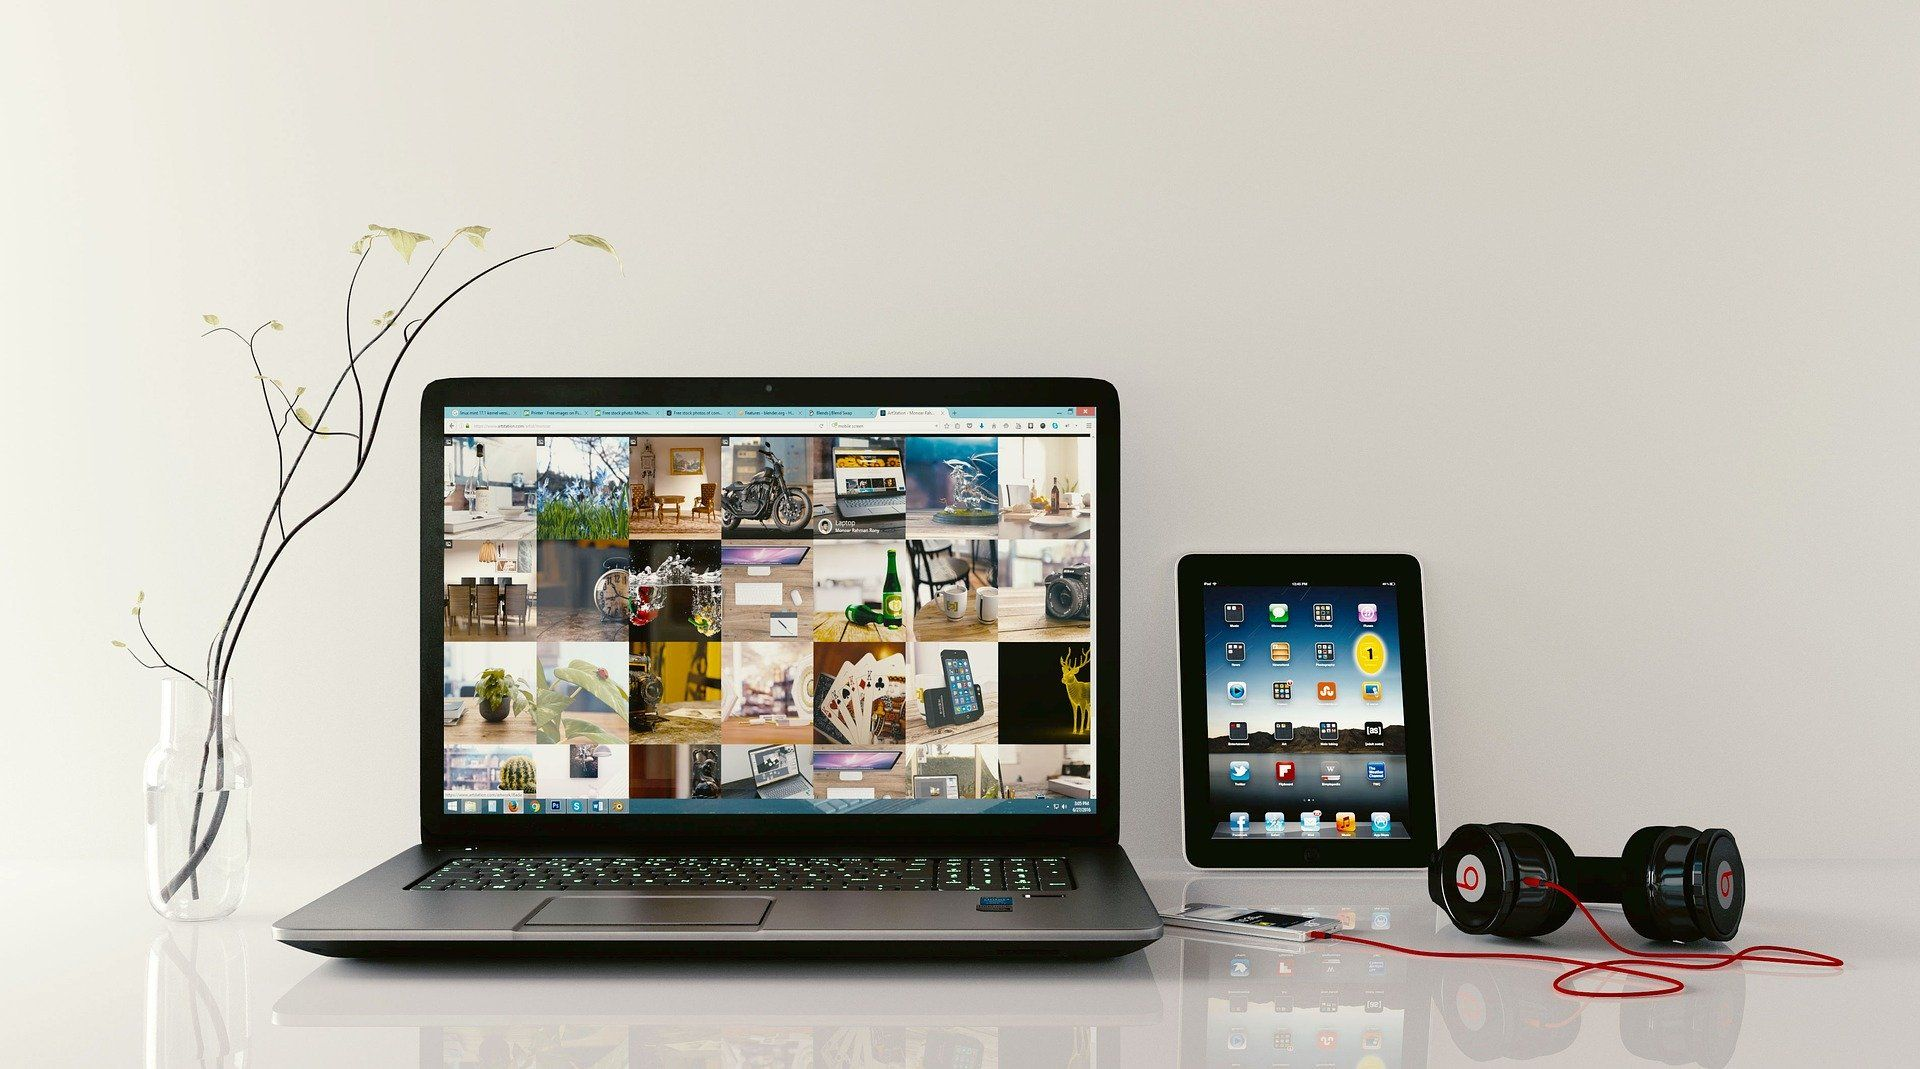 Best Laptop for Basic Internet Use